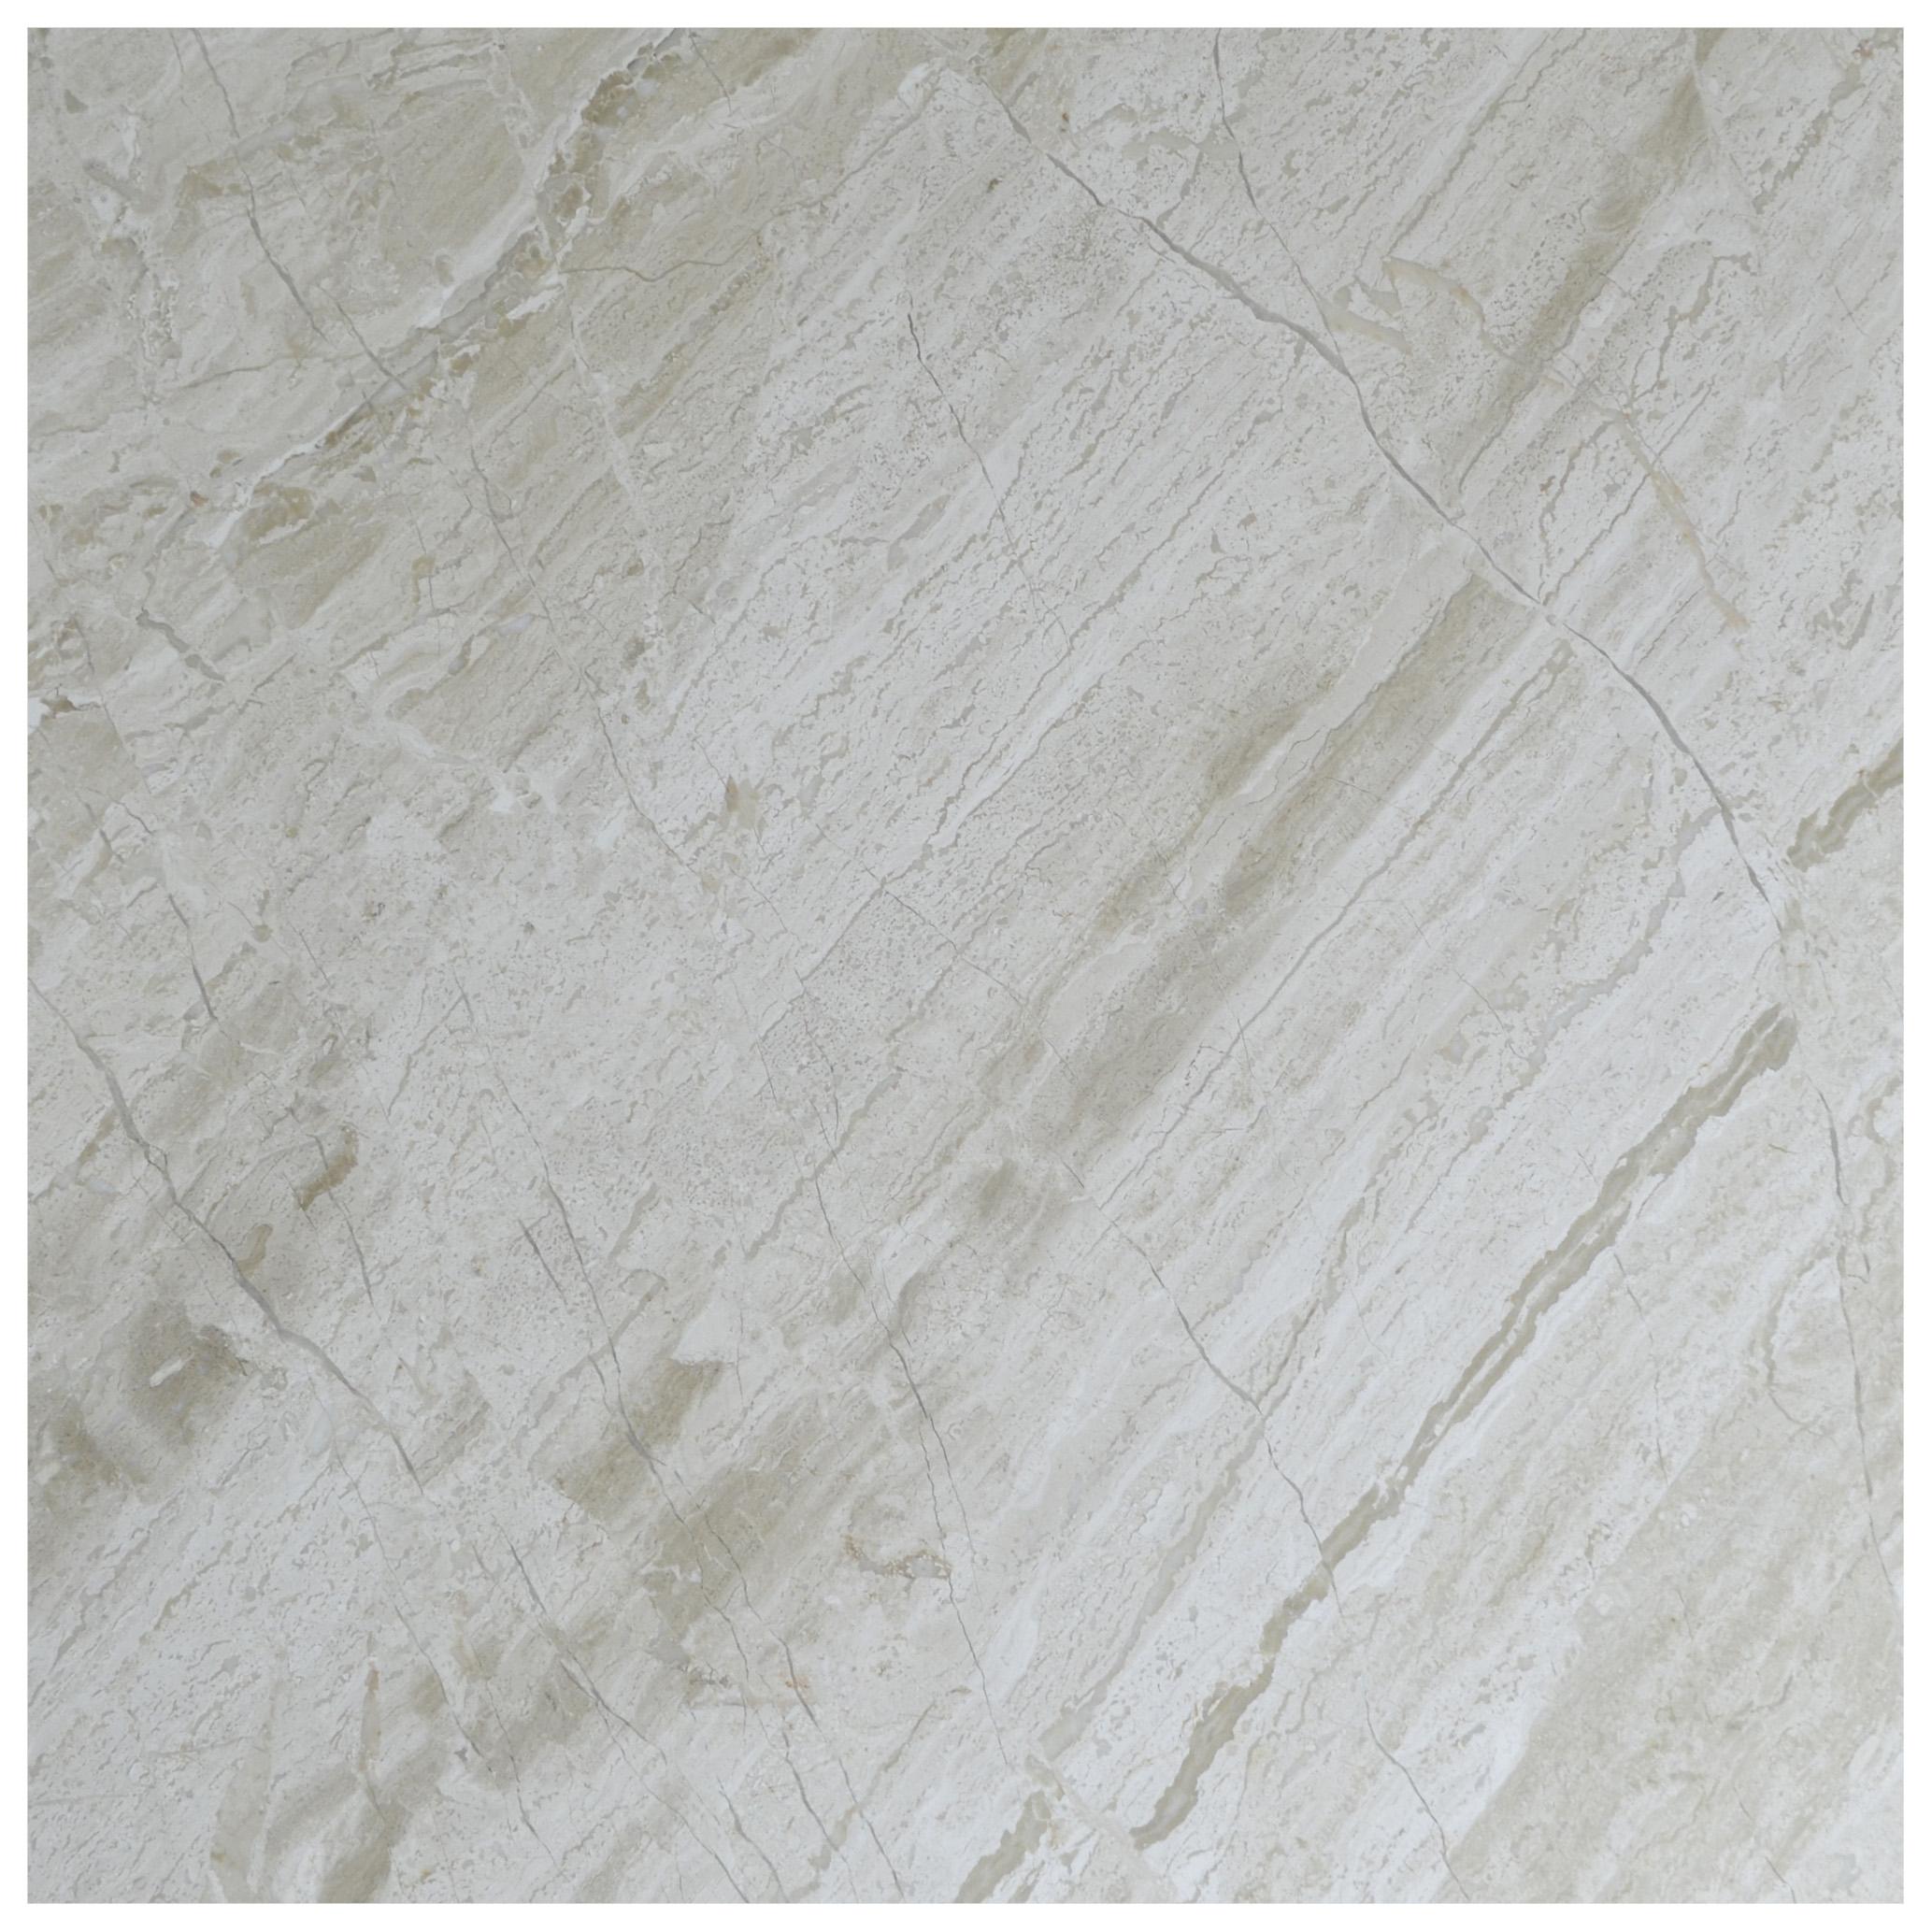 VENICE ANTIQUE POLISHED 24X24 MARBLE TILE -marble sale-Atlantic Stone Source